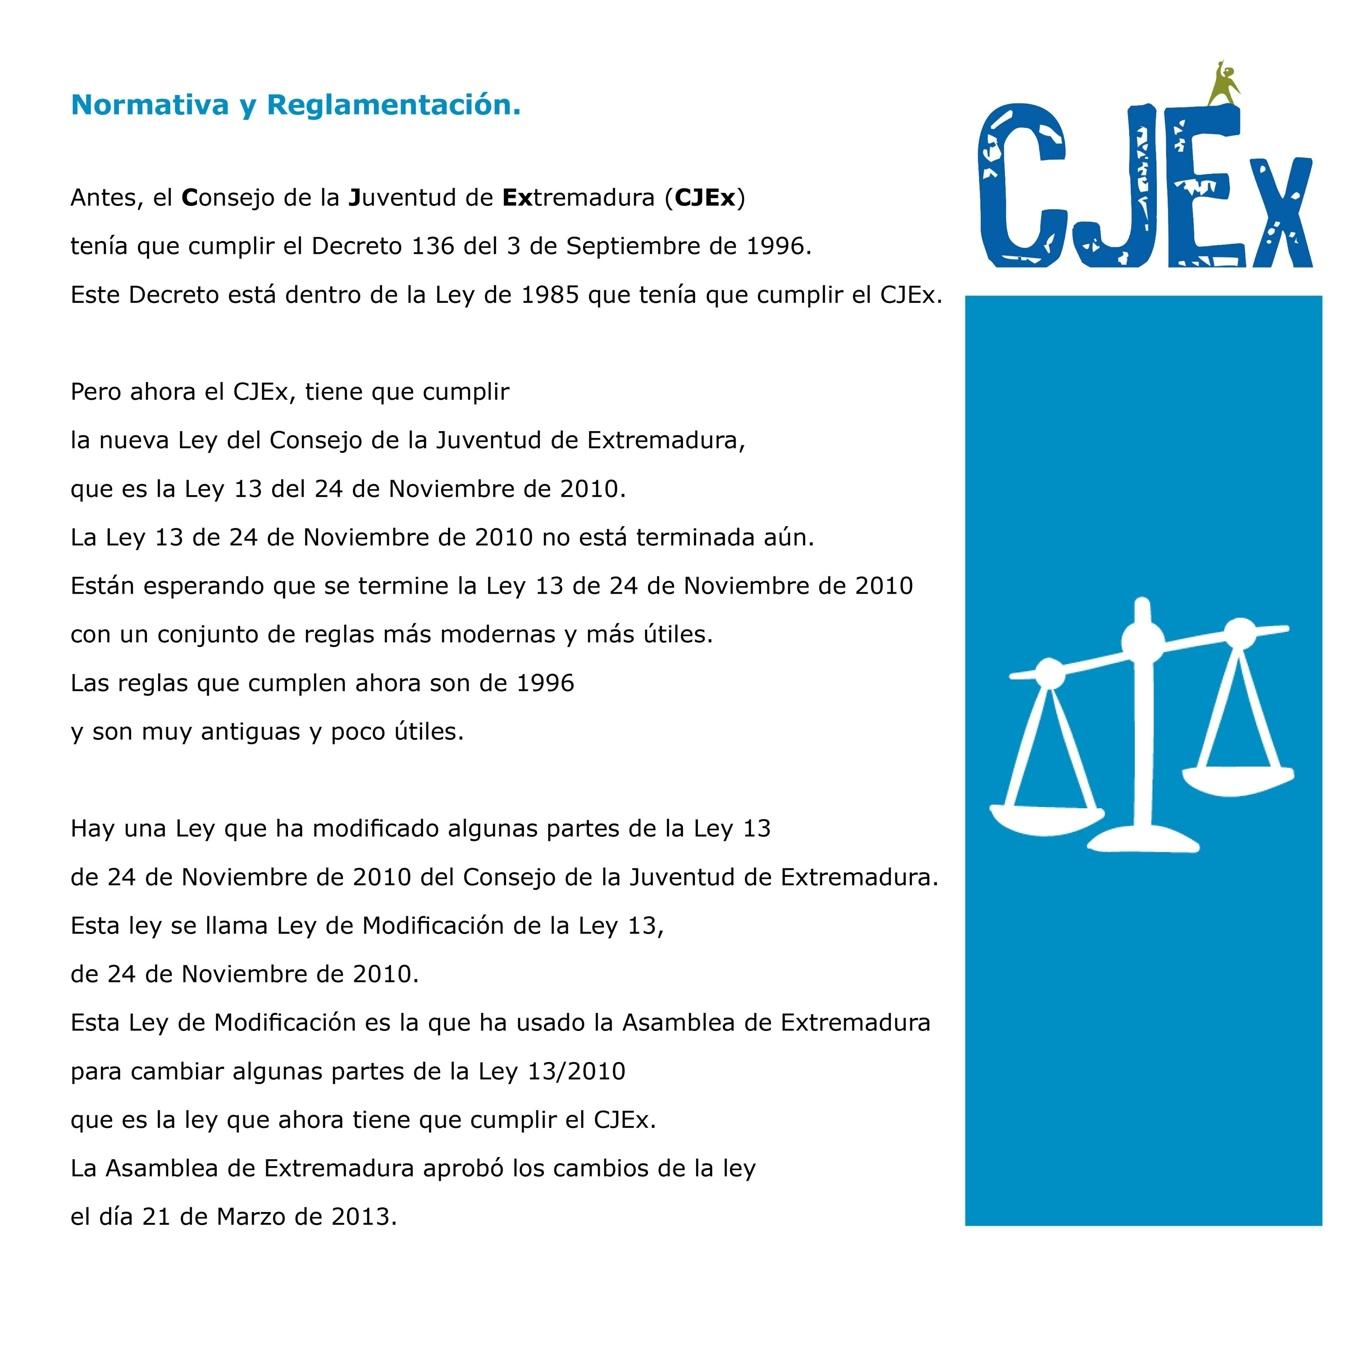 normativa_web_cjex_lf